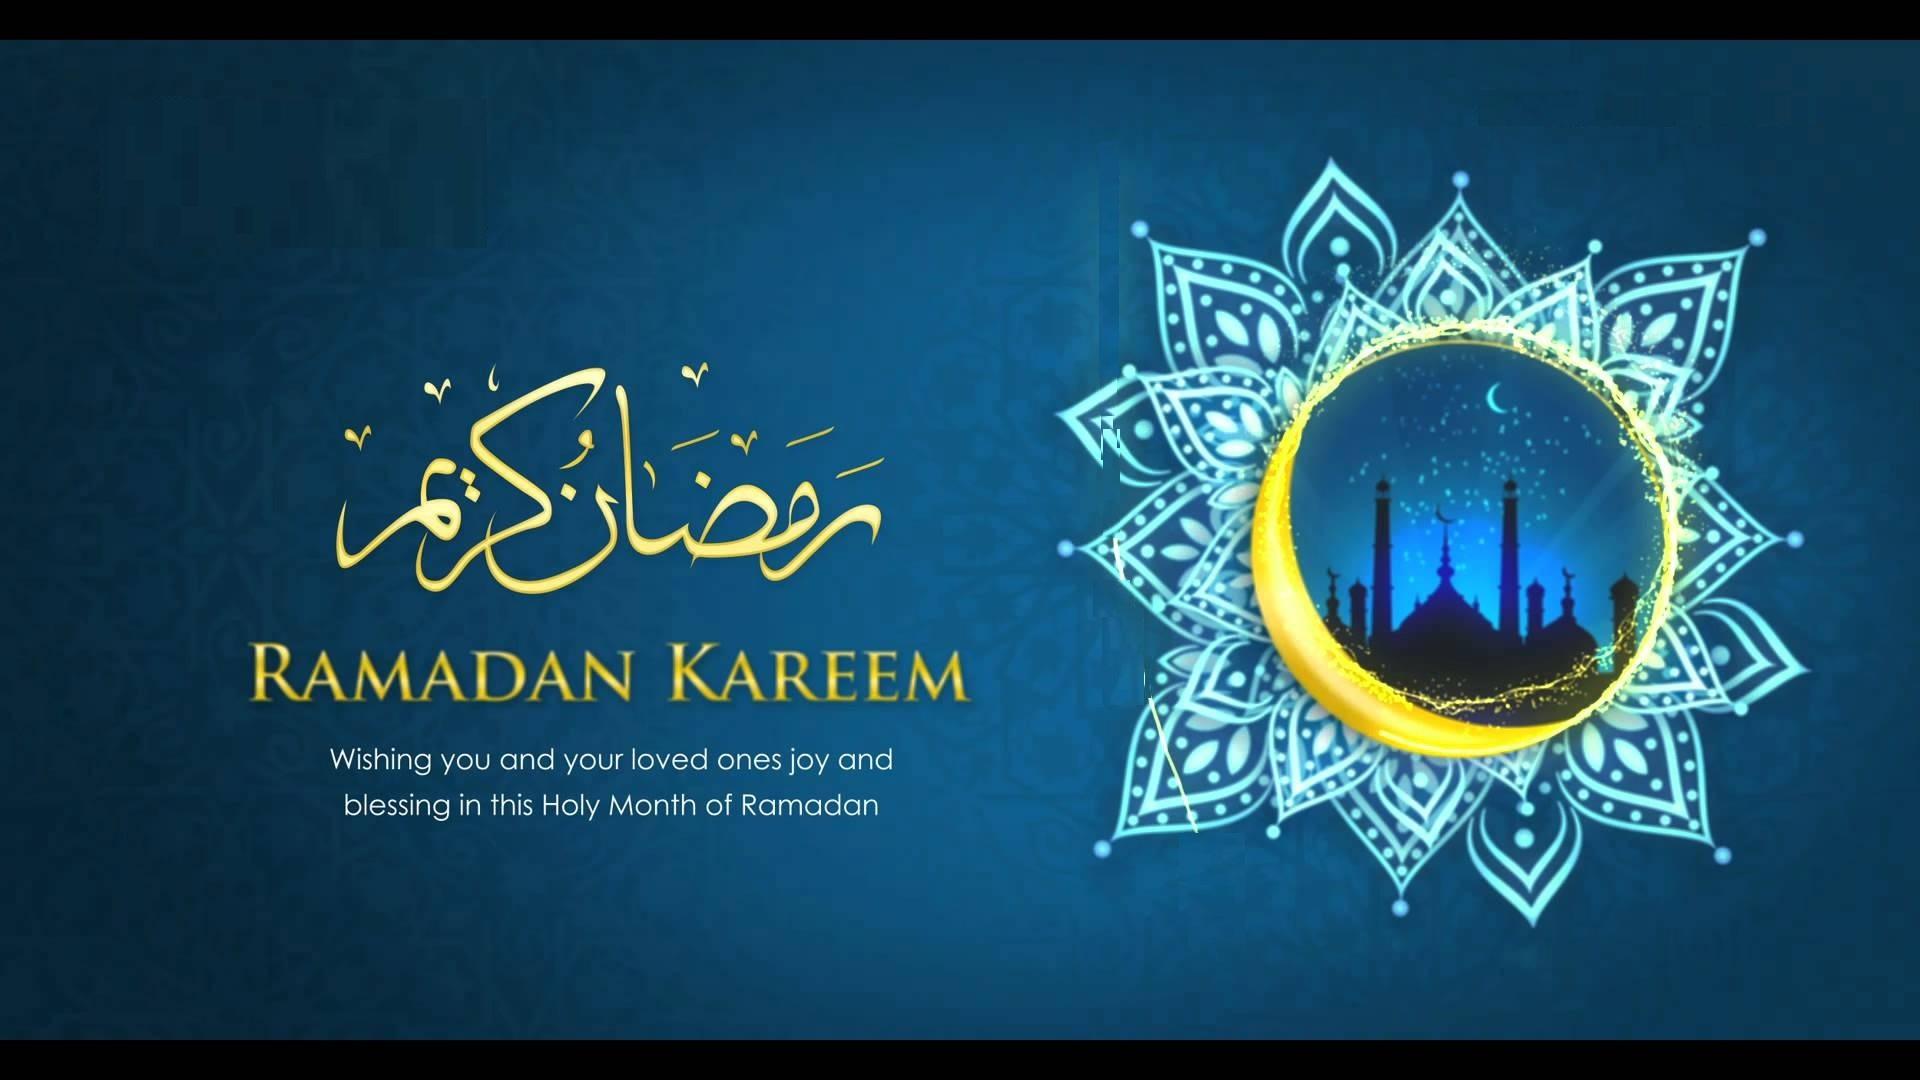 Ramadan greetings wishes images car wallpapers ramadan kristyandbryce Image collections